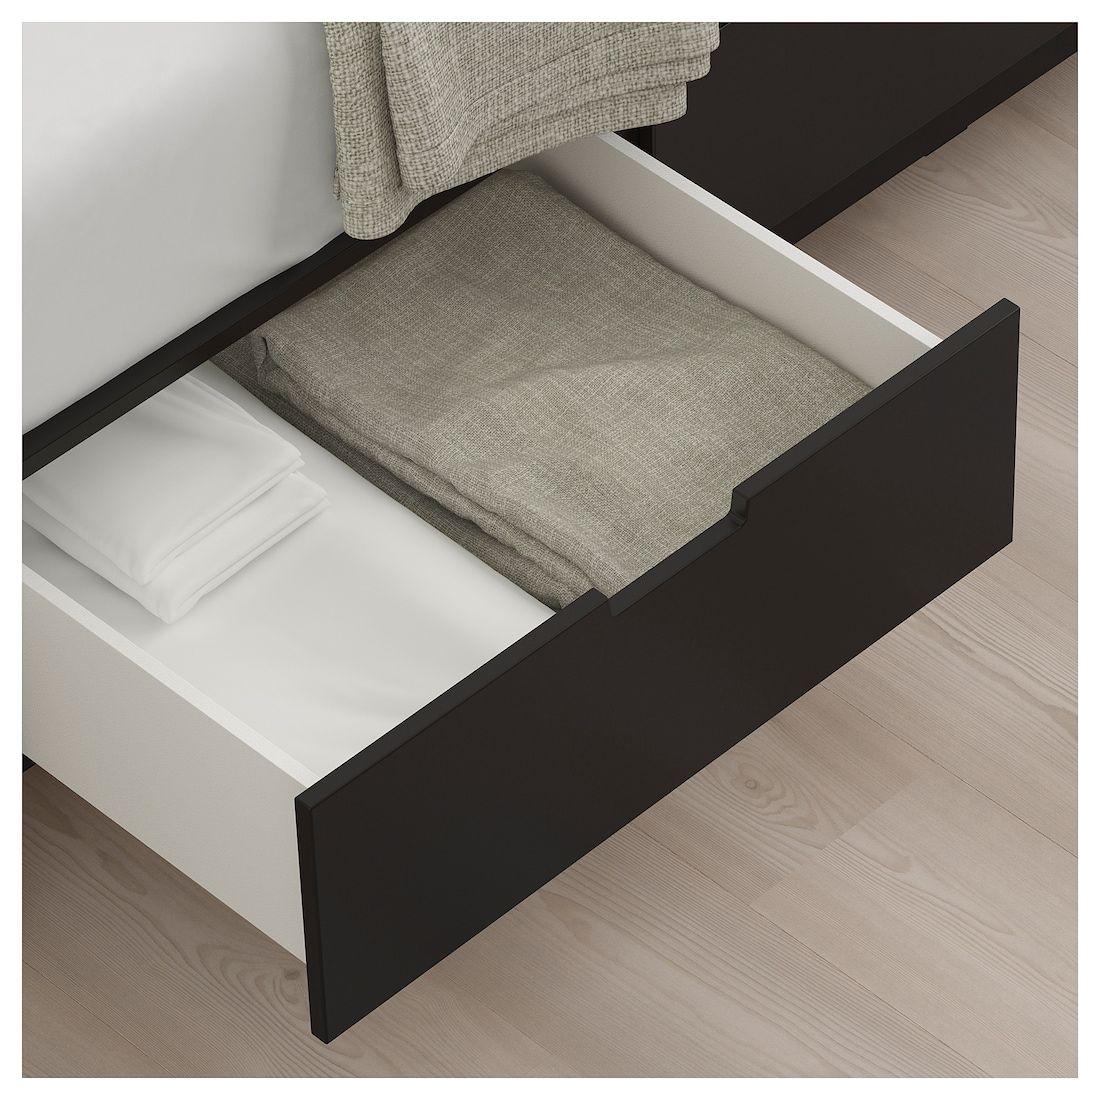 Nordli Bettgestell Mit Schubladen Anthrazit 140x200 Cm Ikea Deutschland Bettgestell Bett Ideen Bett Lagerung